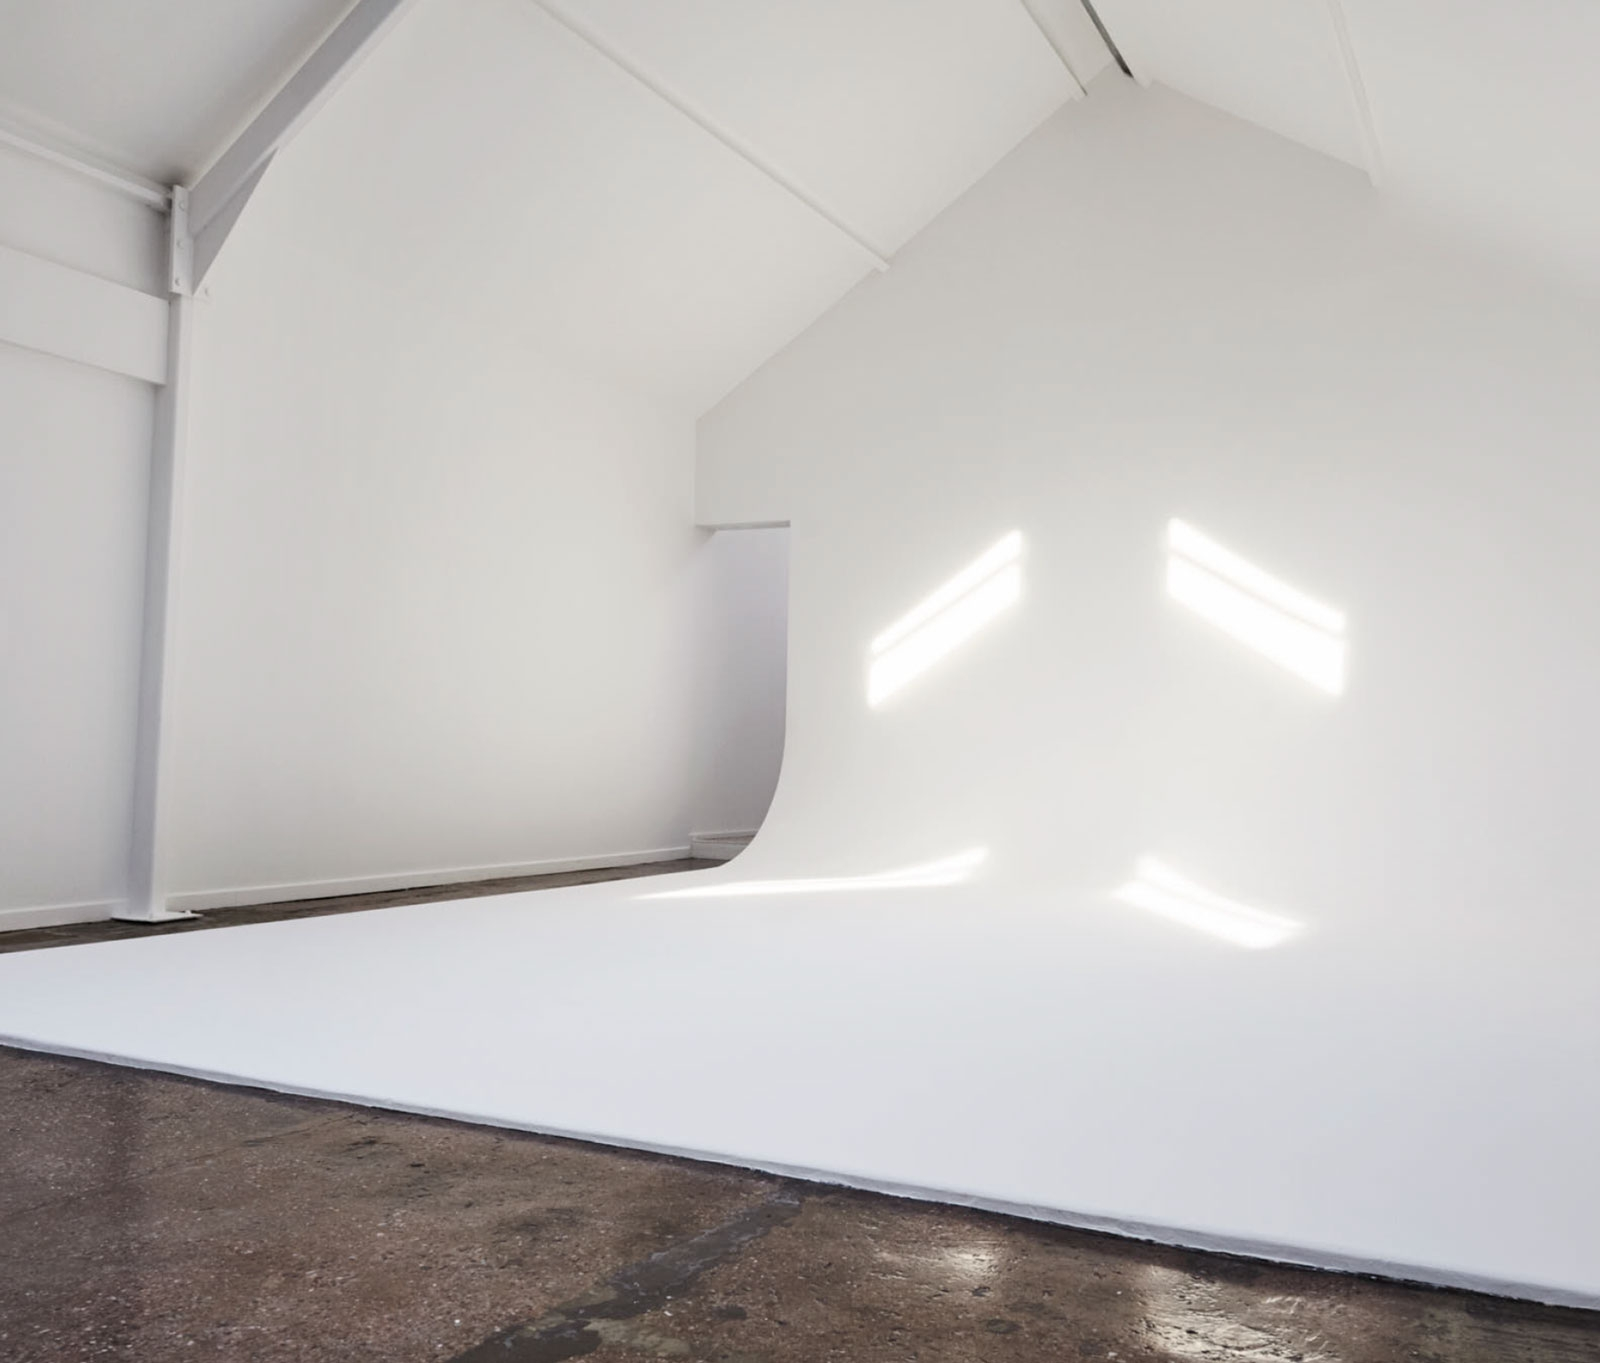 fiveourstudios Studio 1